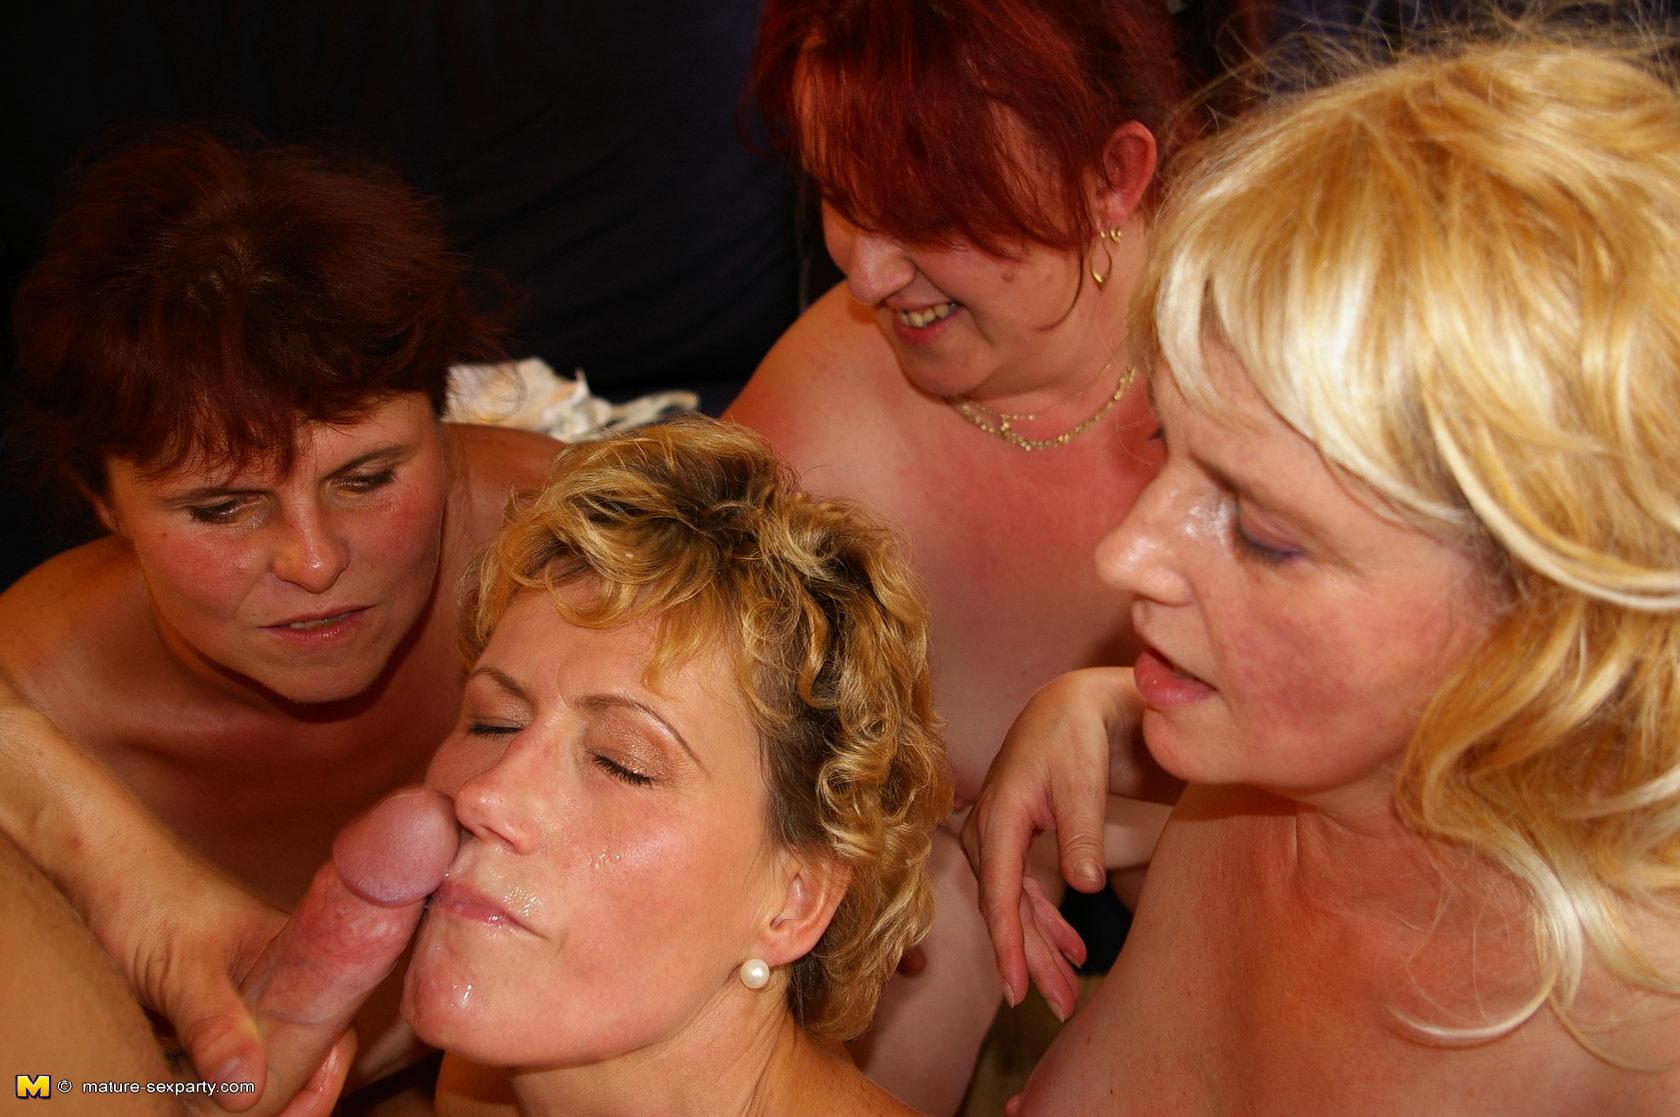 Nude dancing culbs ontario ca